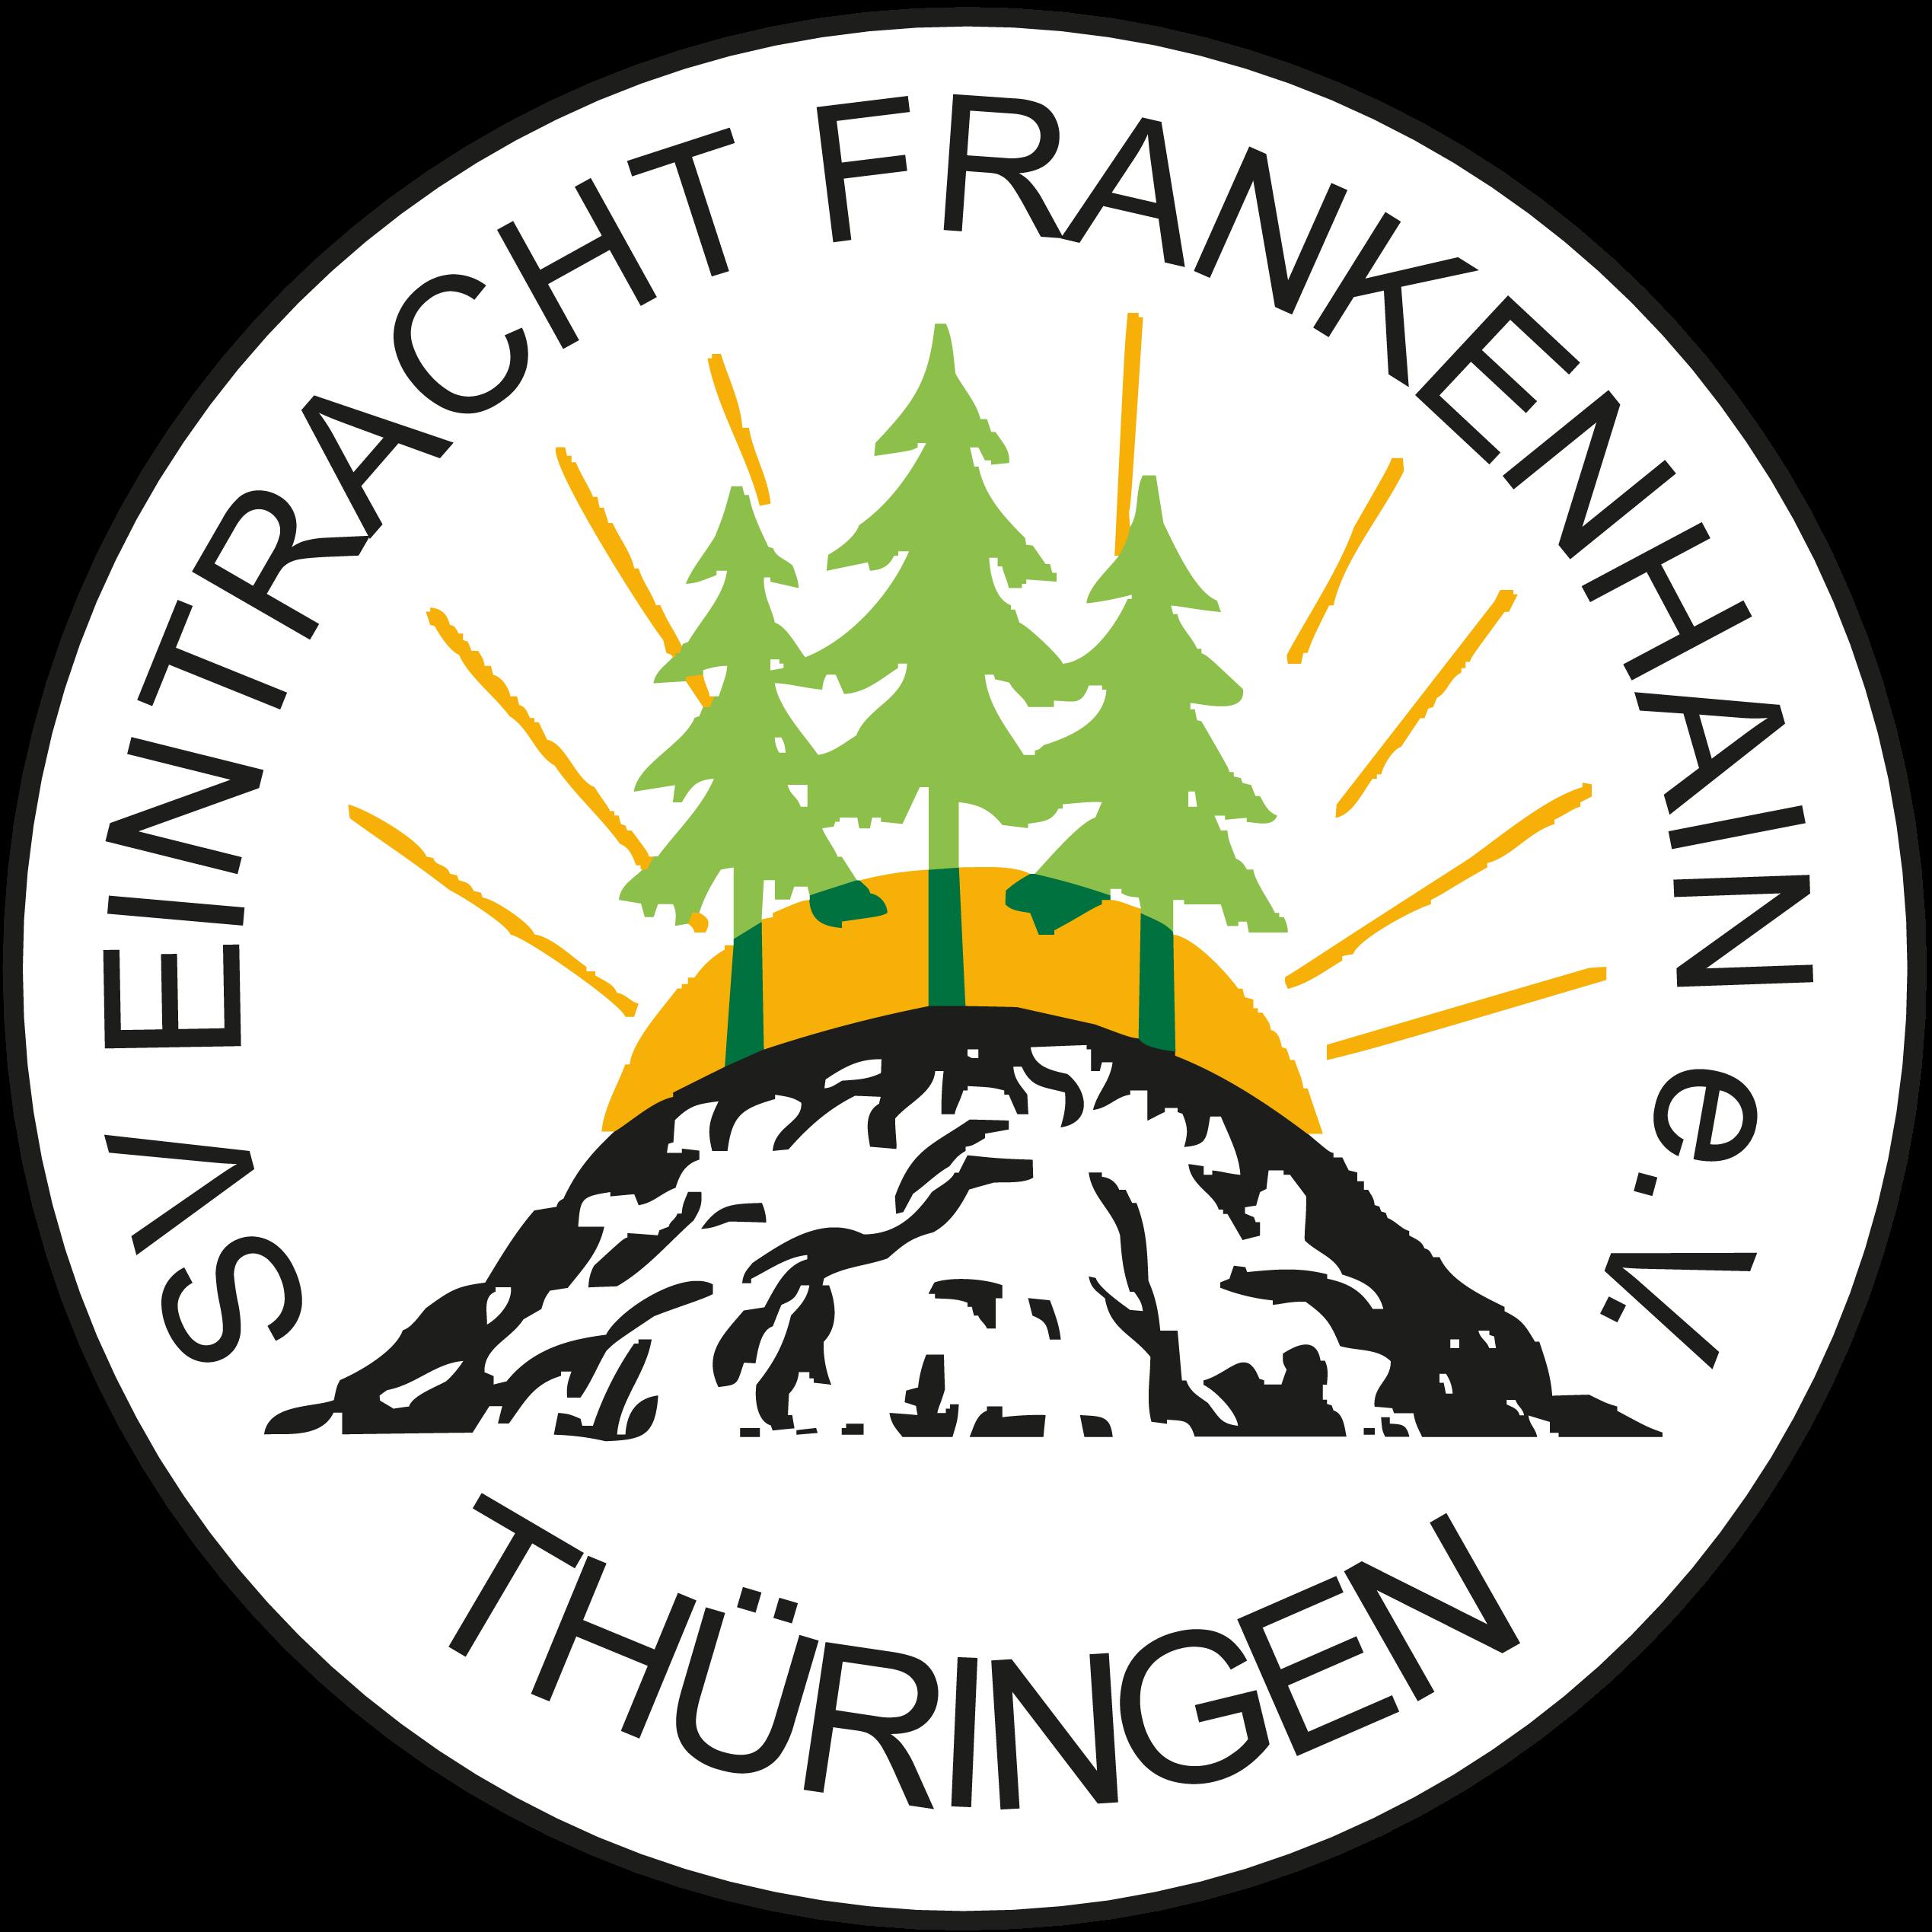 Skiverein Eintracht Frankenhain e.V.